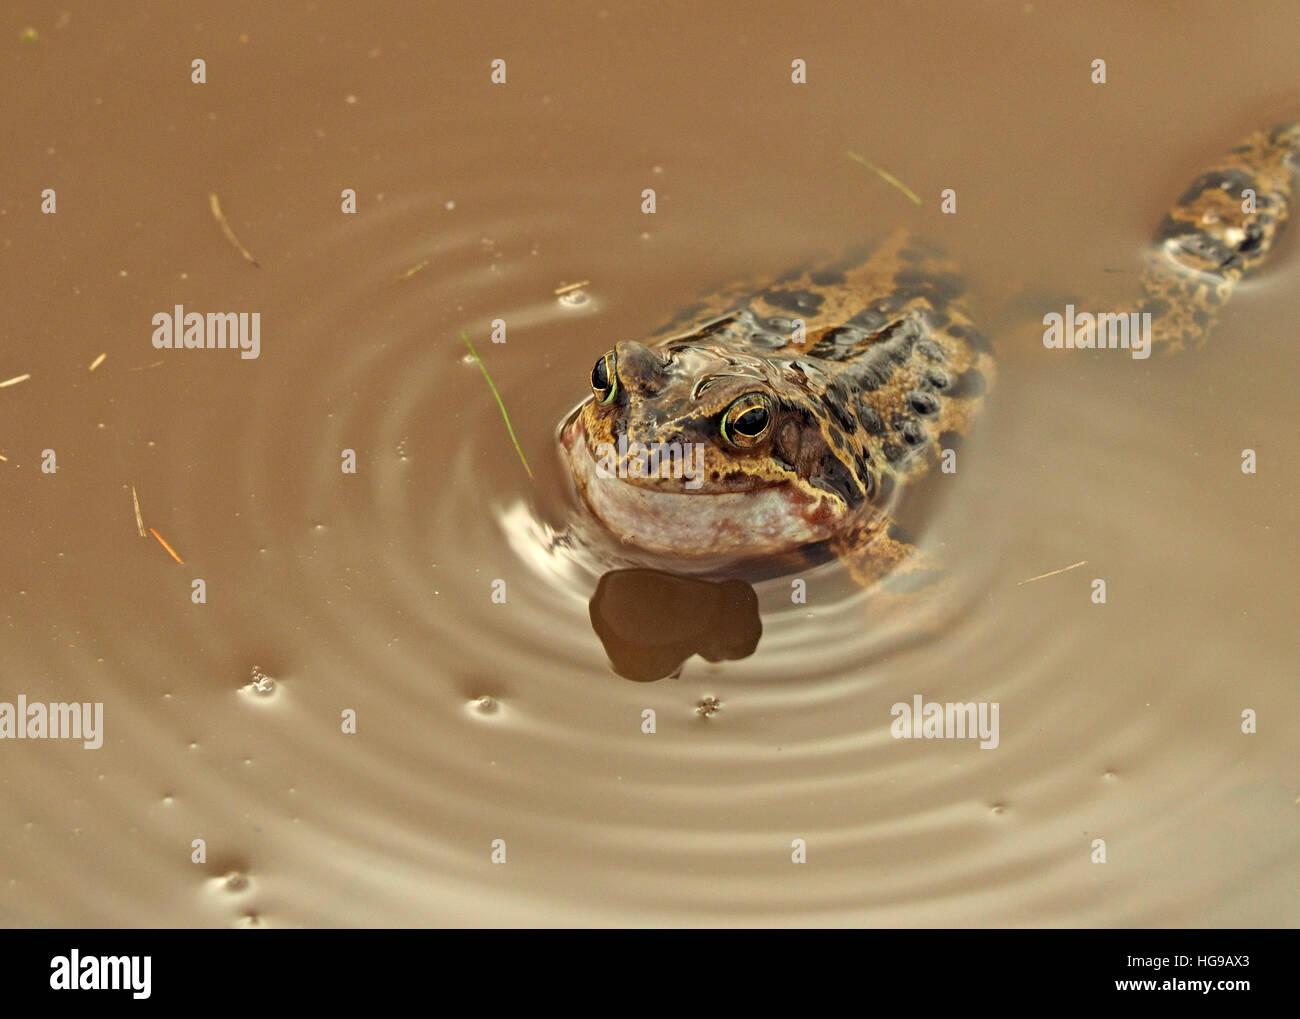 Common Frog (Rana temporaria) European common frog/ European common brown frog/ European grass frog croaking in - Stock Image